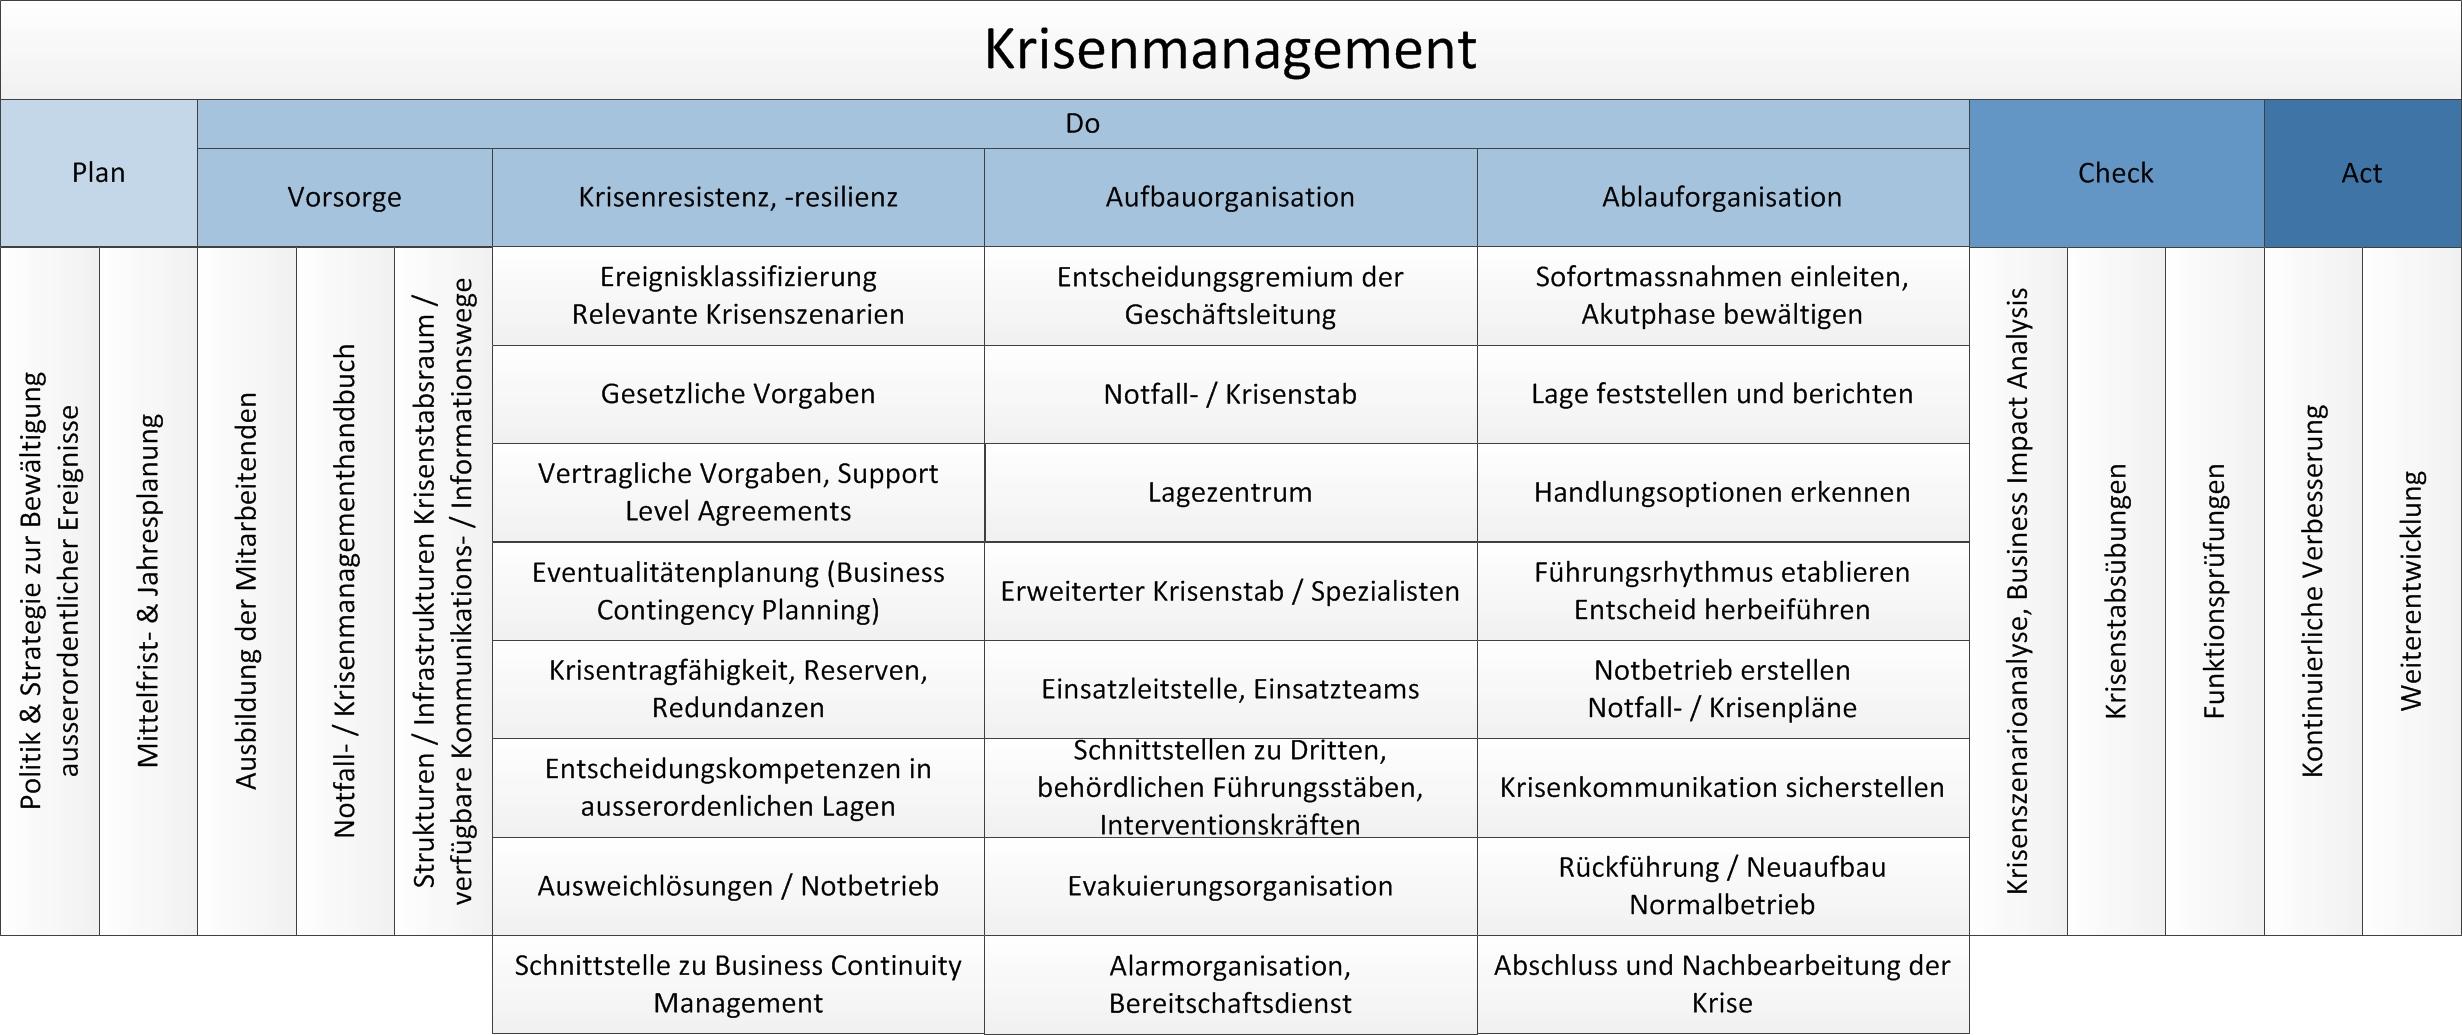 Krisenmanagement, Notfallmanagement, Ereignismanagement, Krisenstab